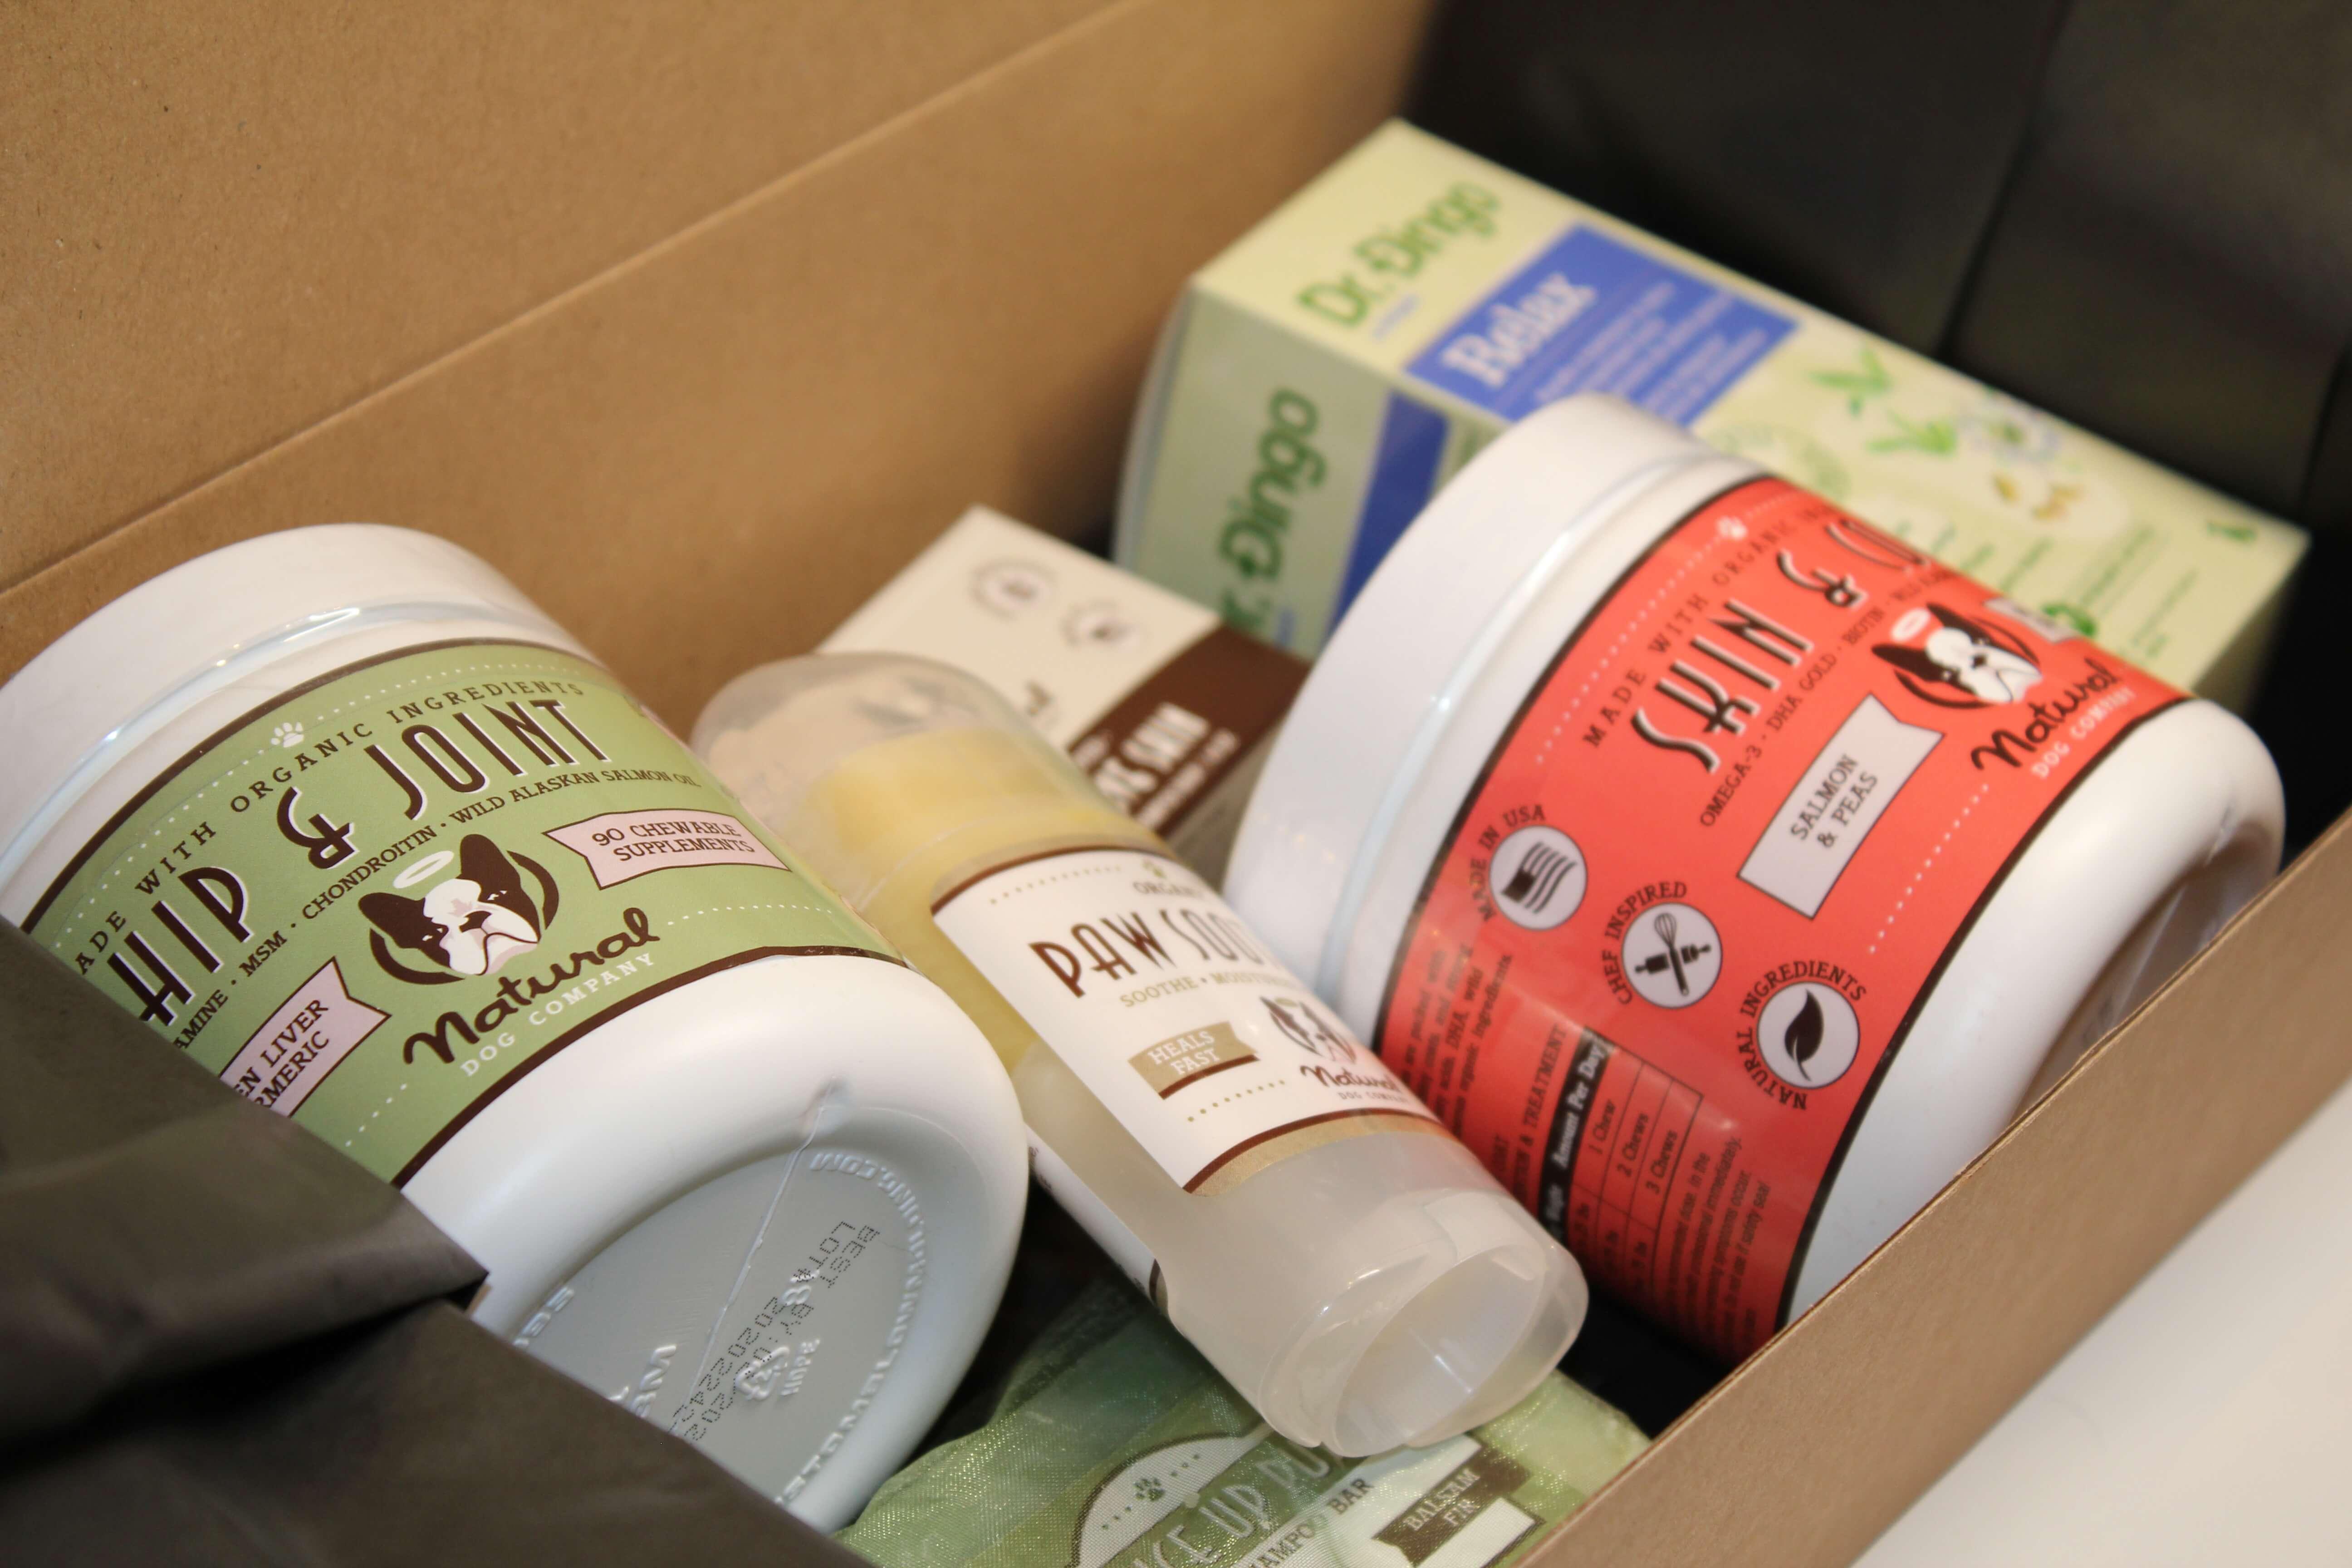 productos para la higiene canina